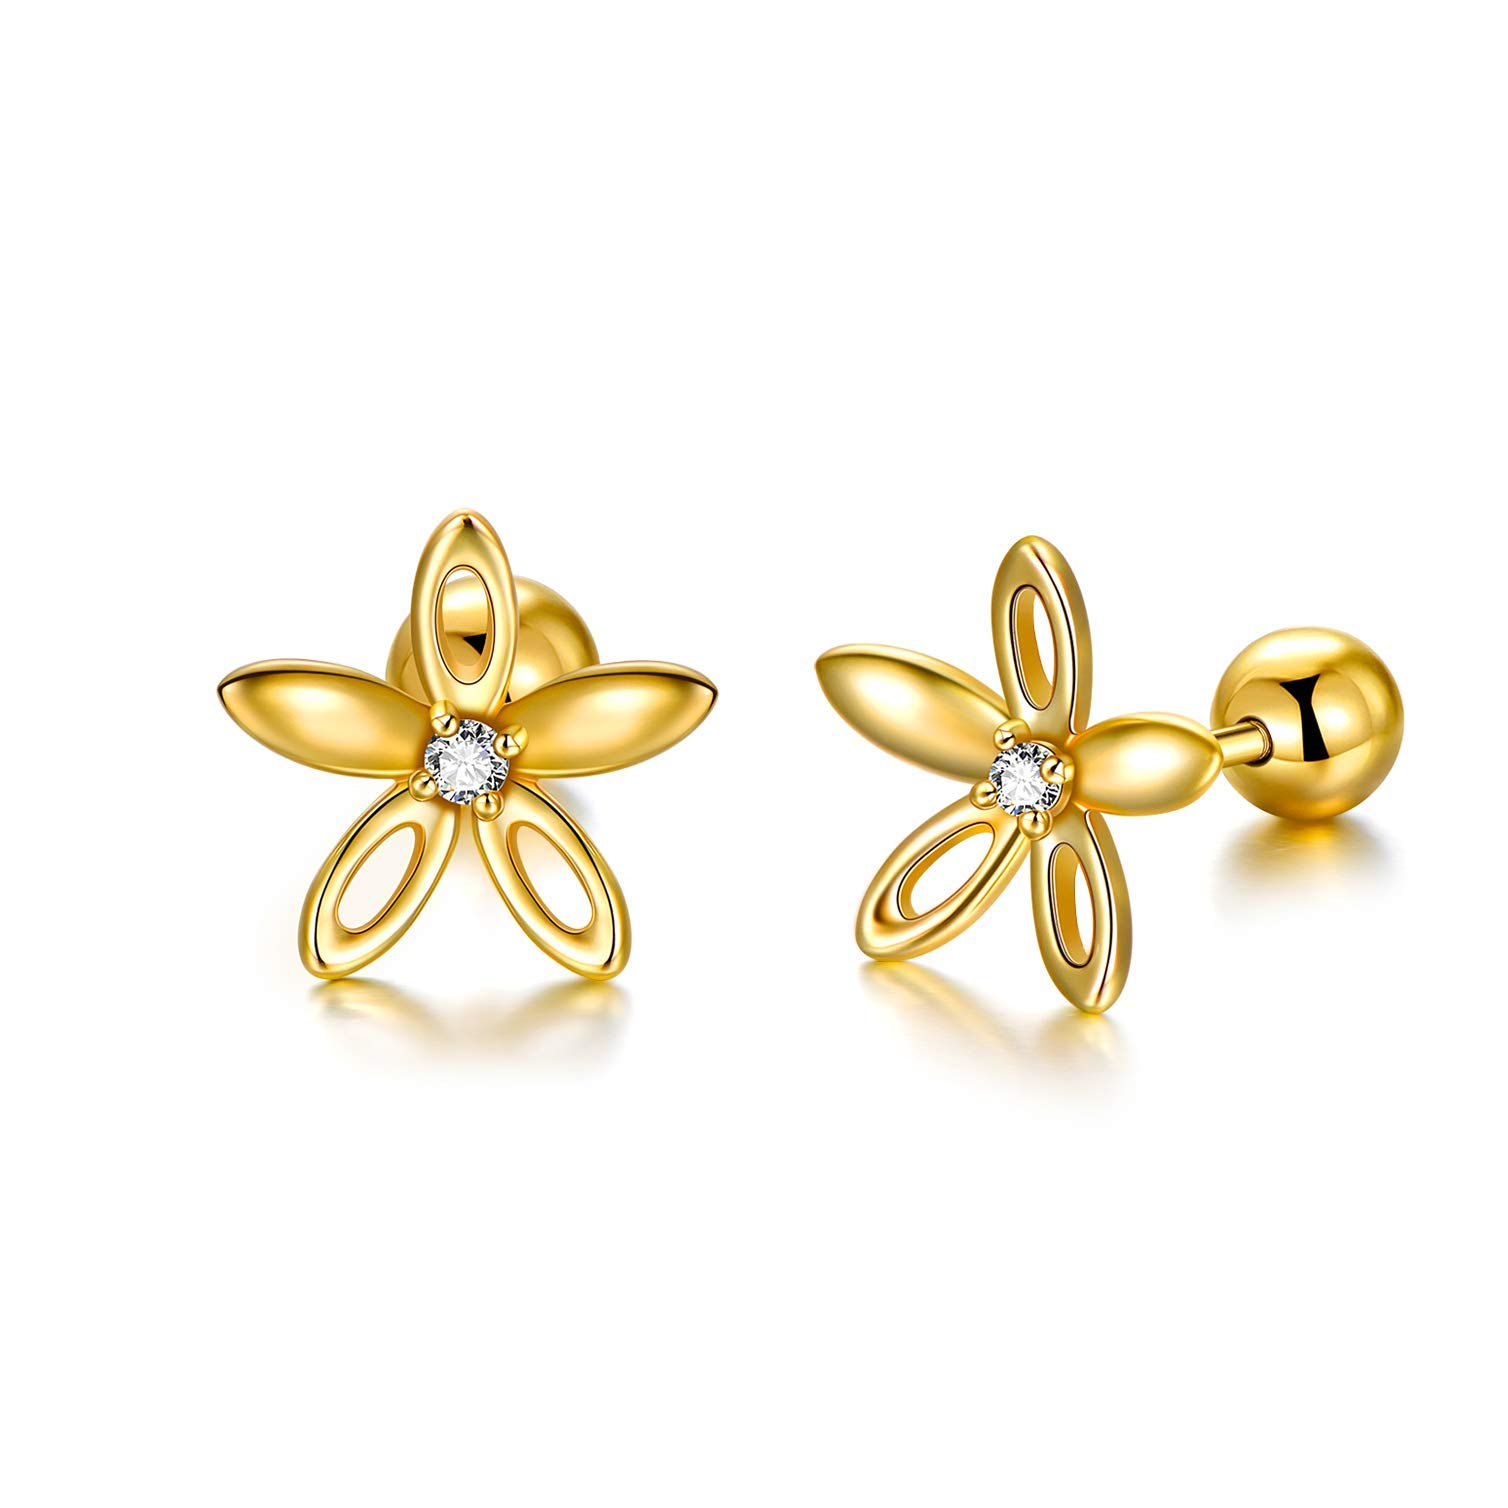 14K Solid Gold Flower Stud Earrings for Women, Dainty Yellow Gold Glamorous Flower Earrings for Sensitive Ear Fine Jewelry Gift for Women, Girls